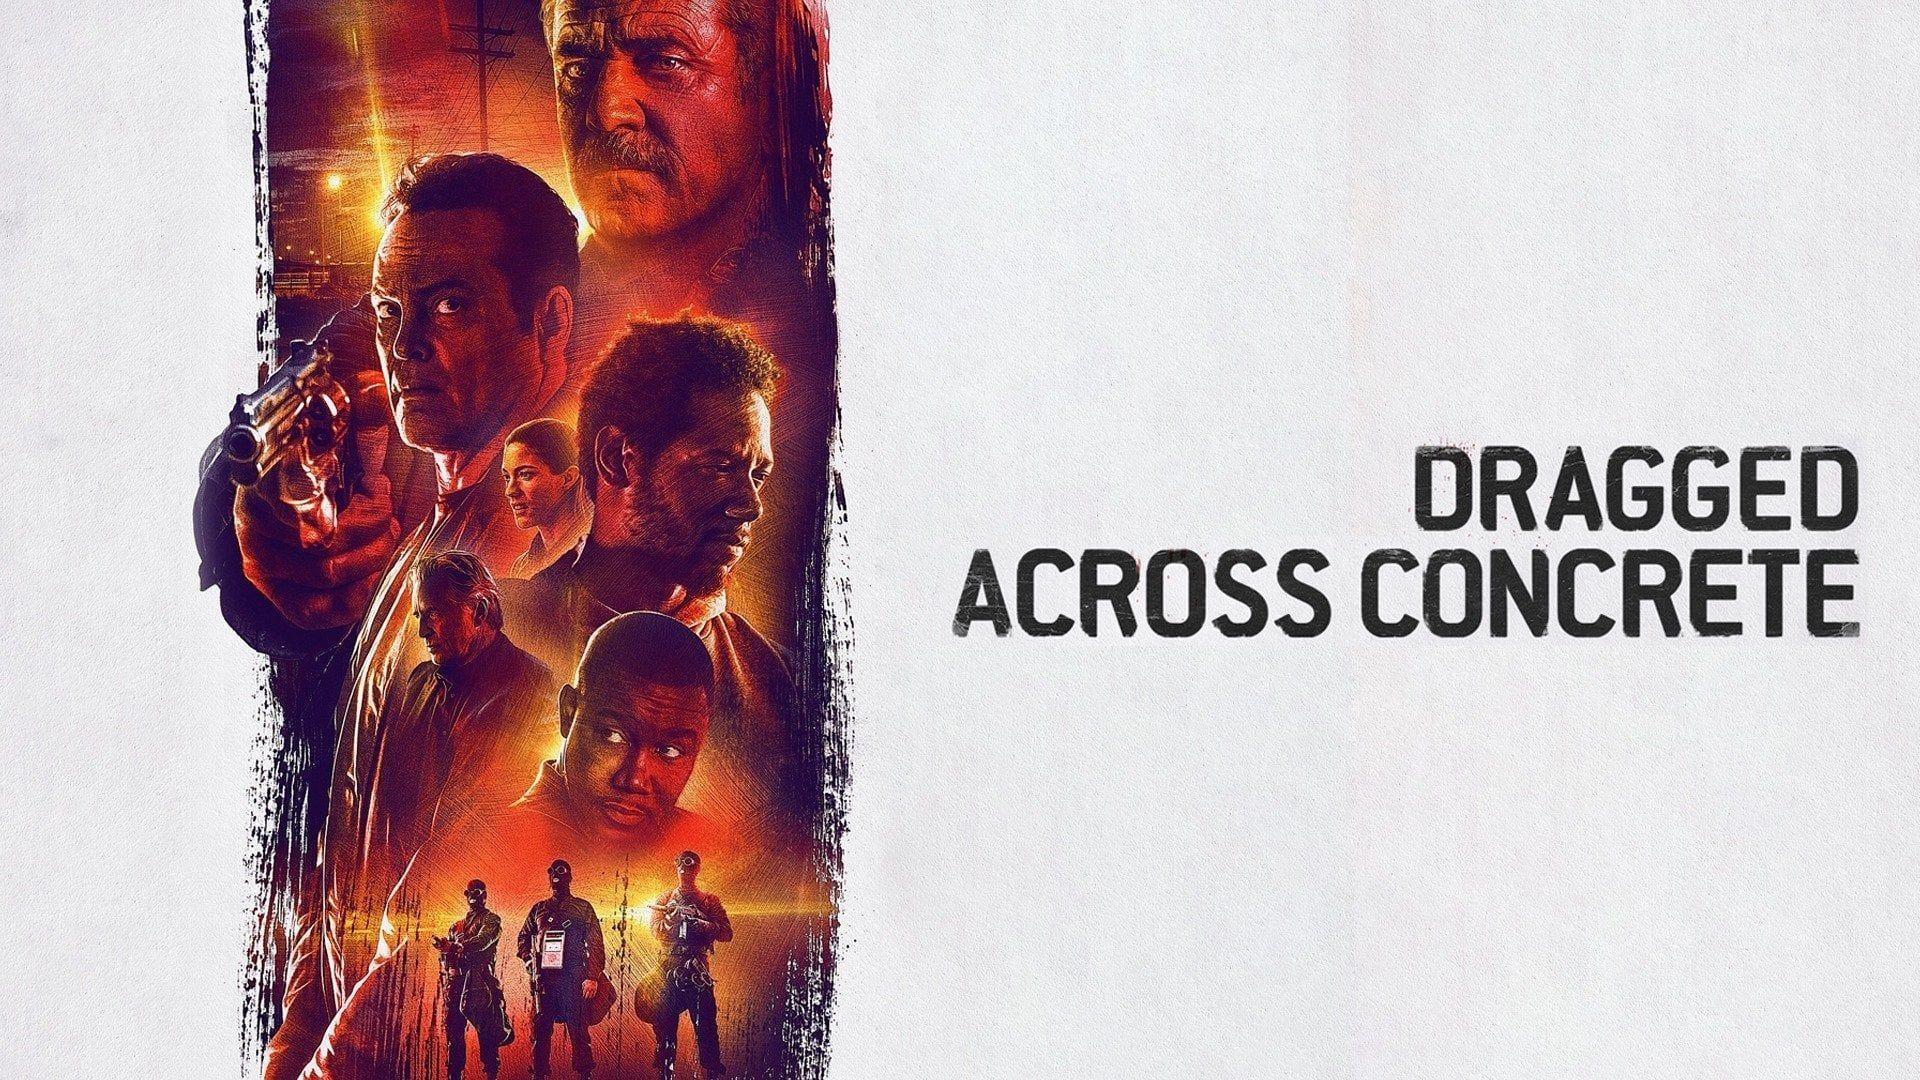 Dragged Across Concrete 2019 Ganzer Film Deutsch Komplett Kino Ganze Filme Neue Filme Filme